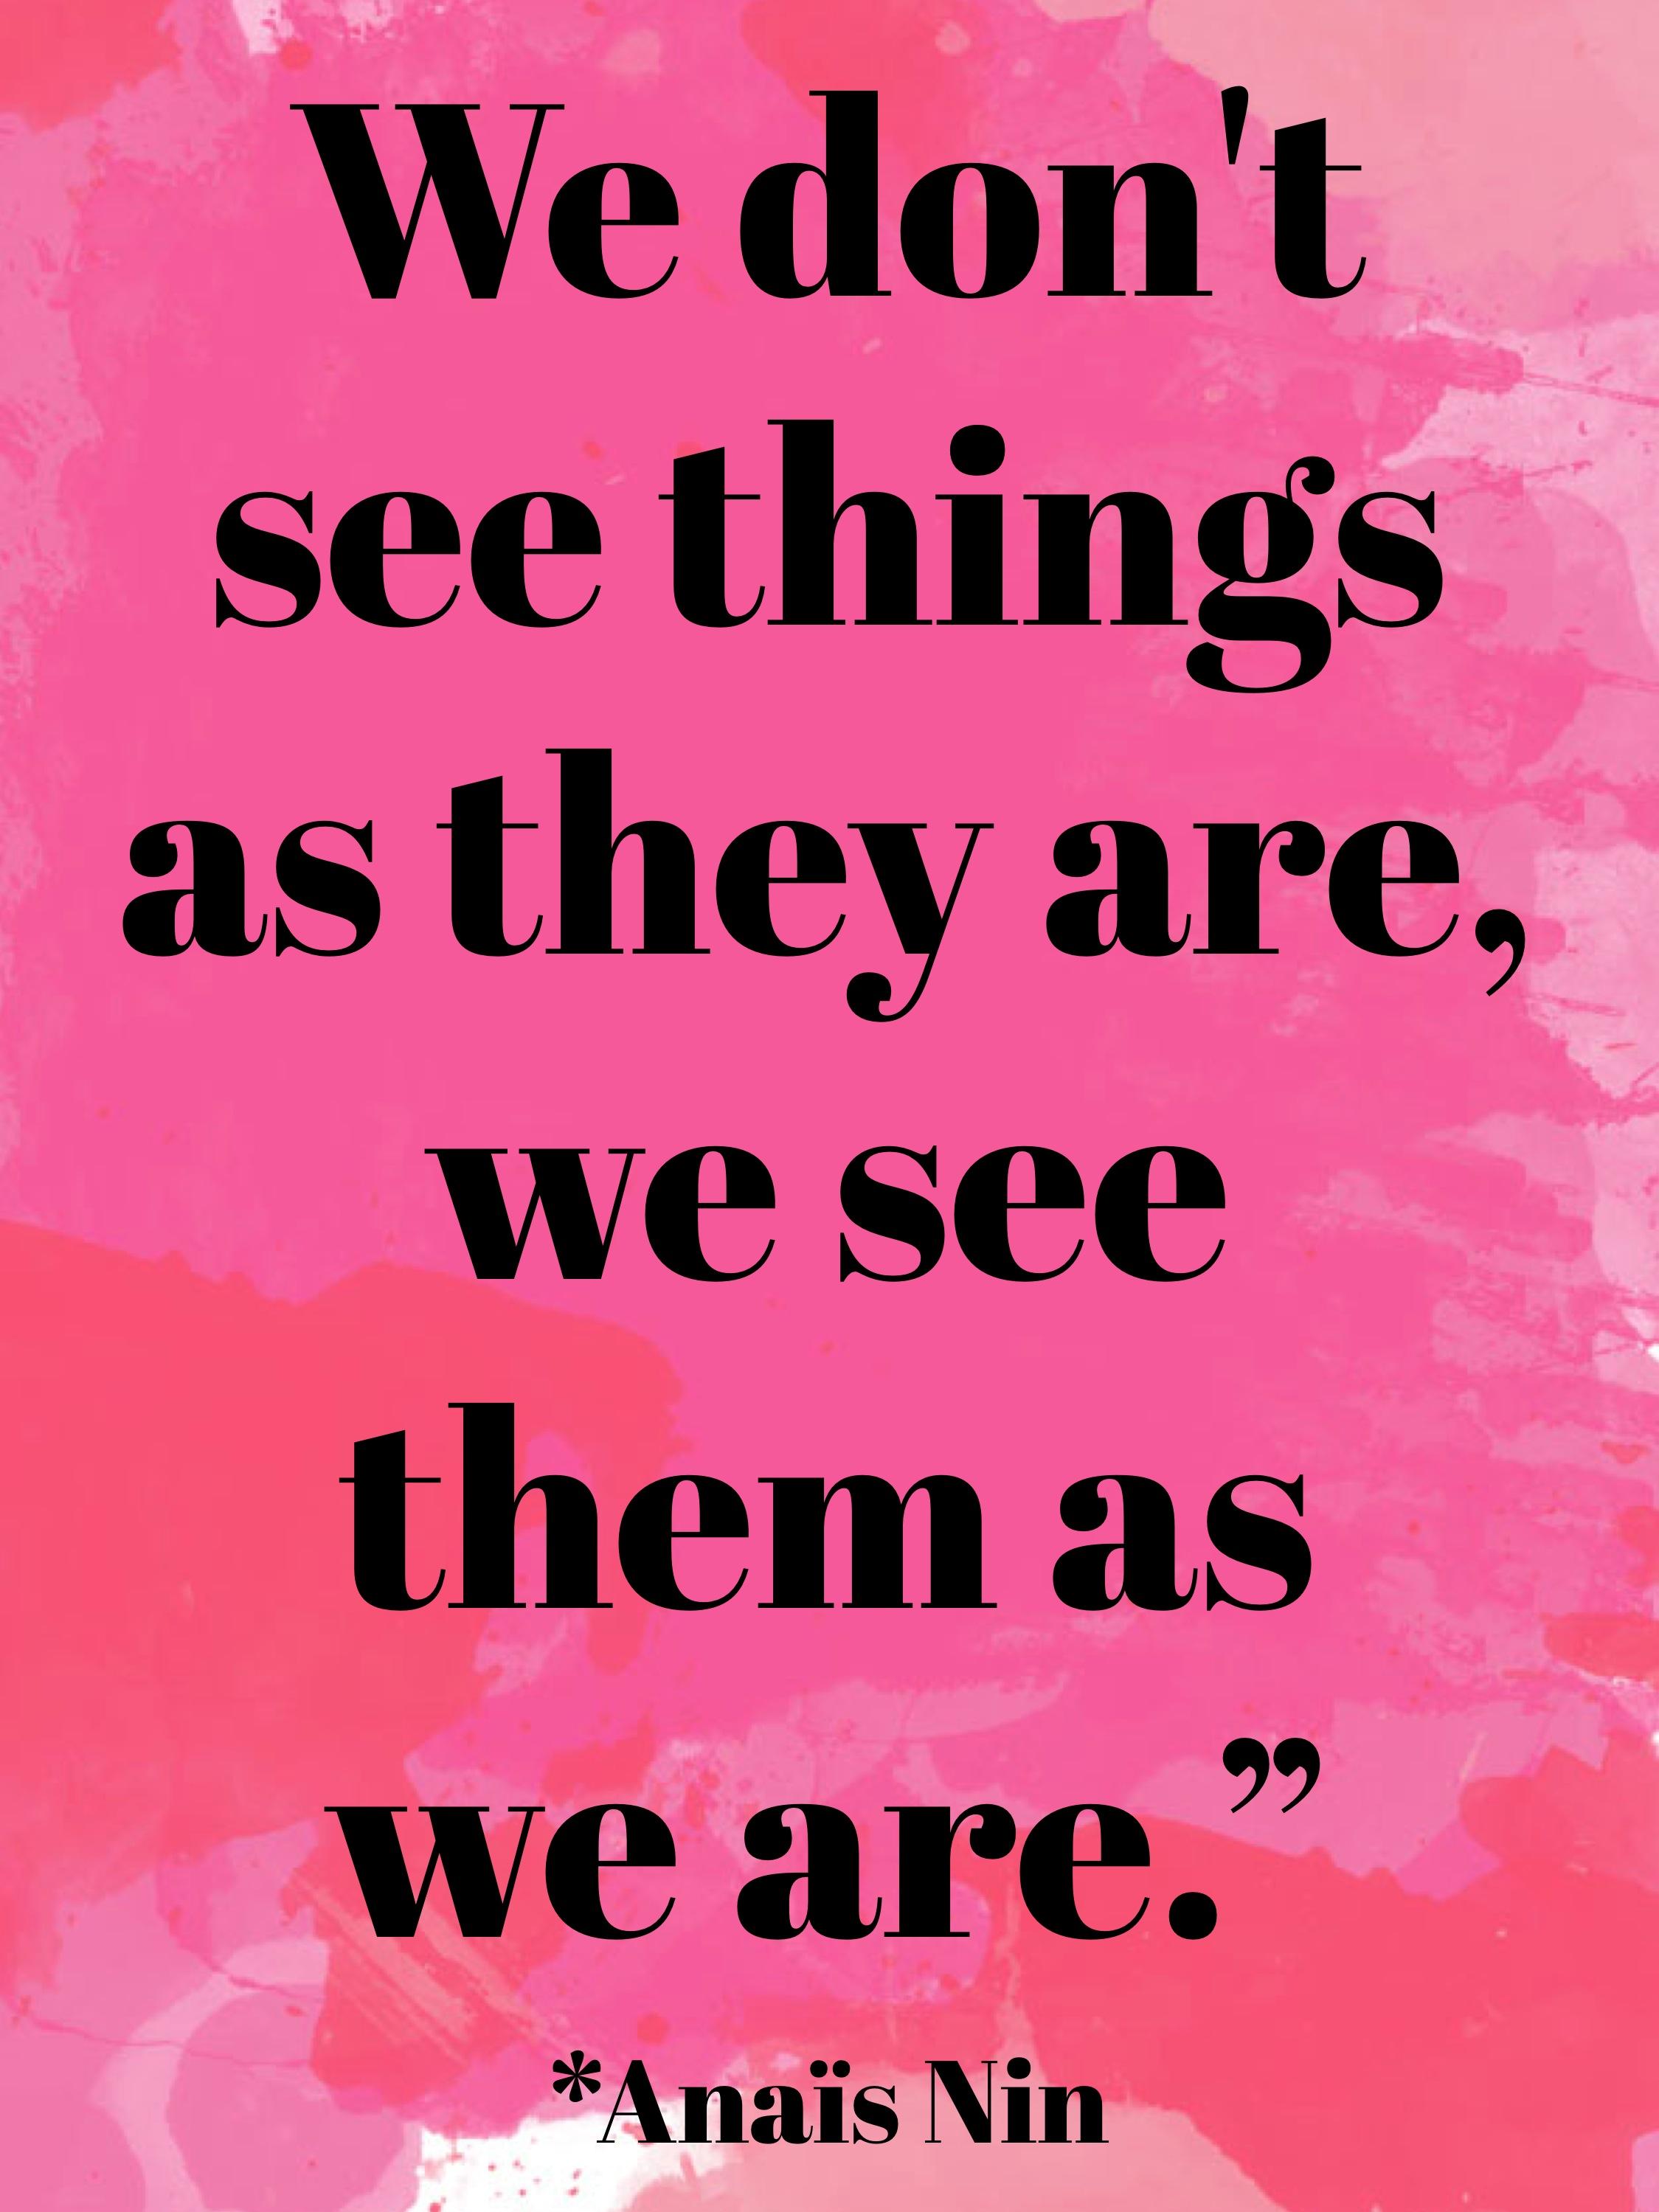 Anais Nin Quotes About Imagination Quotesgram